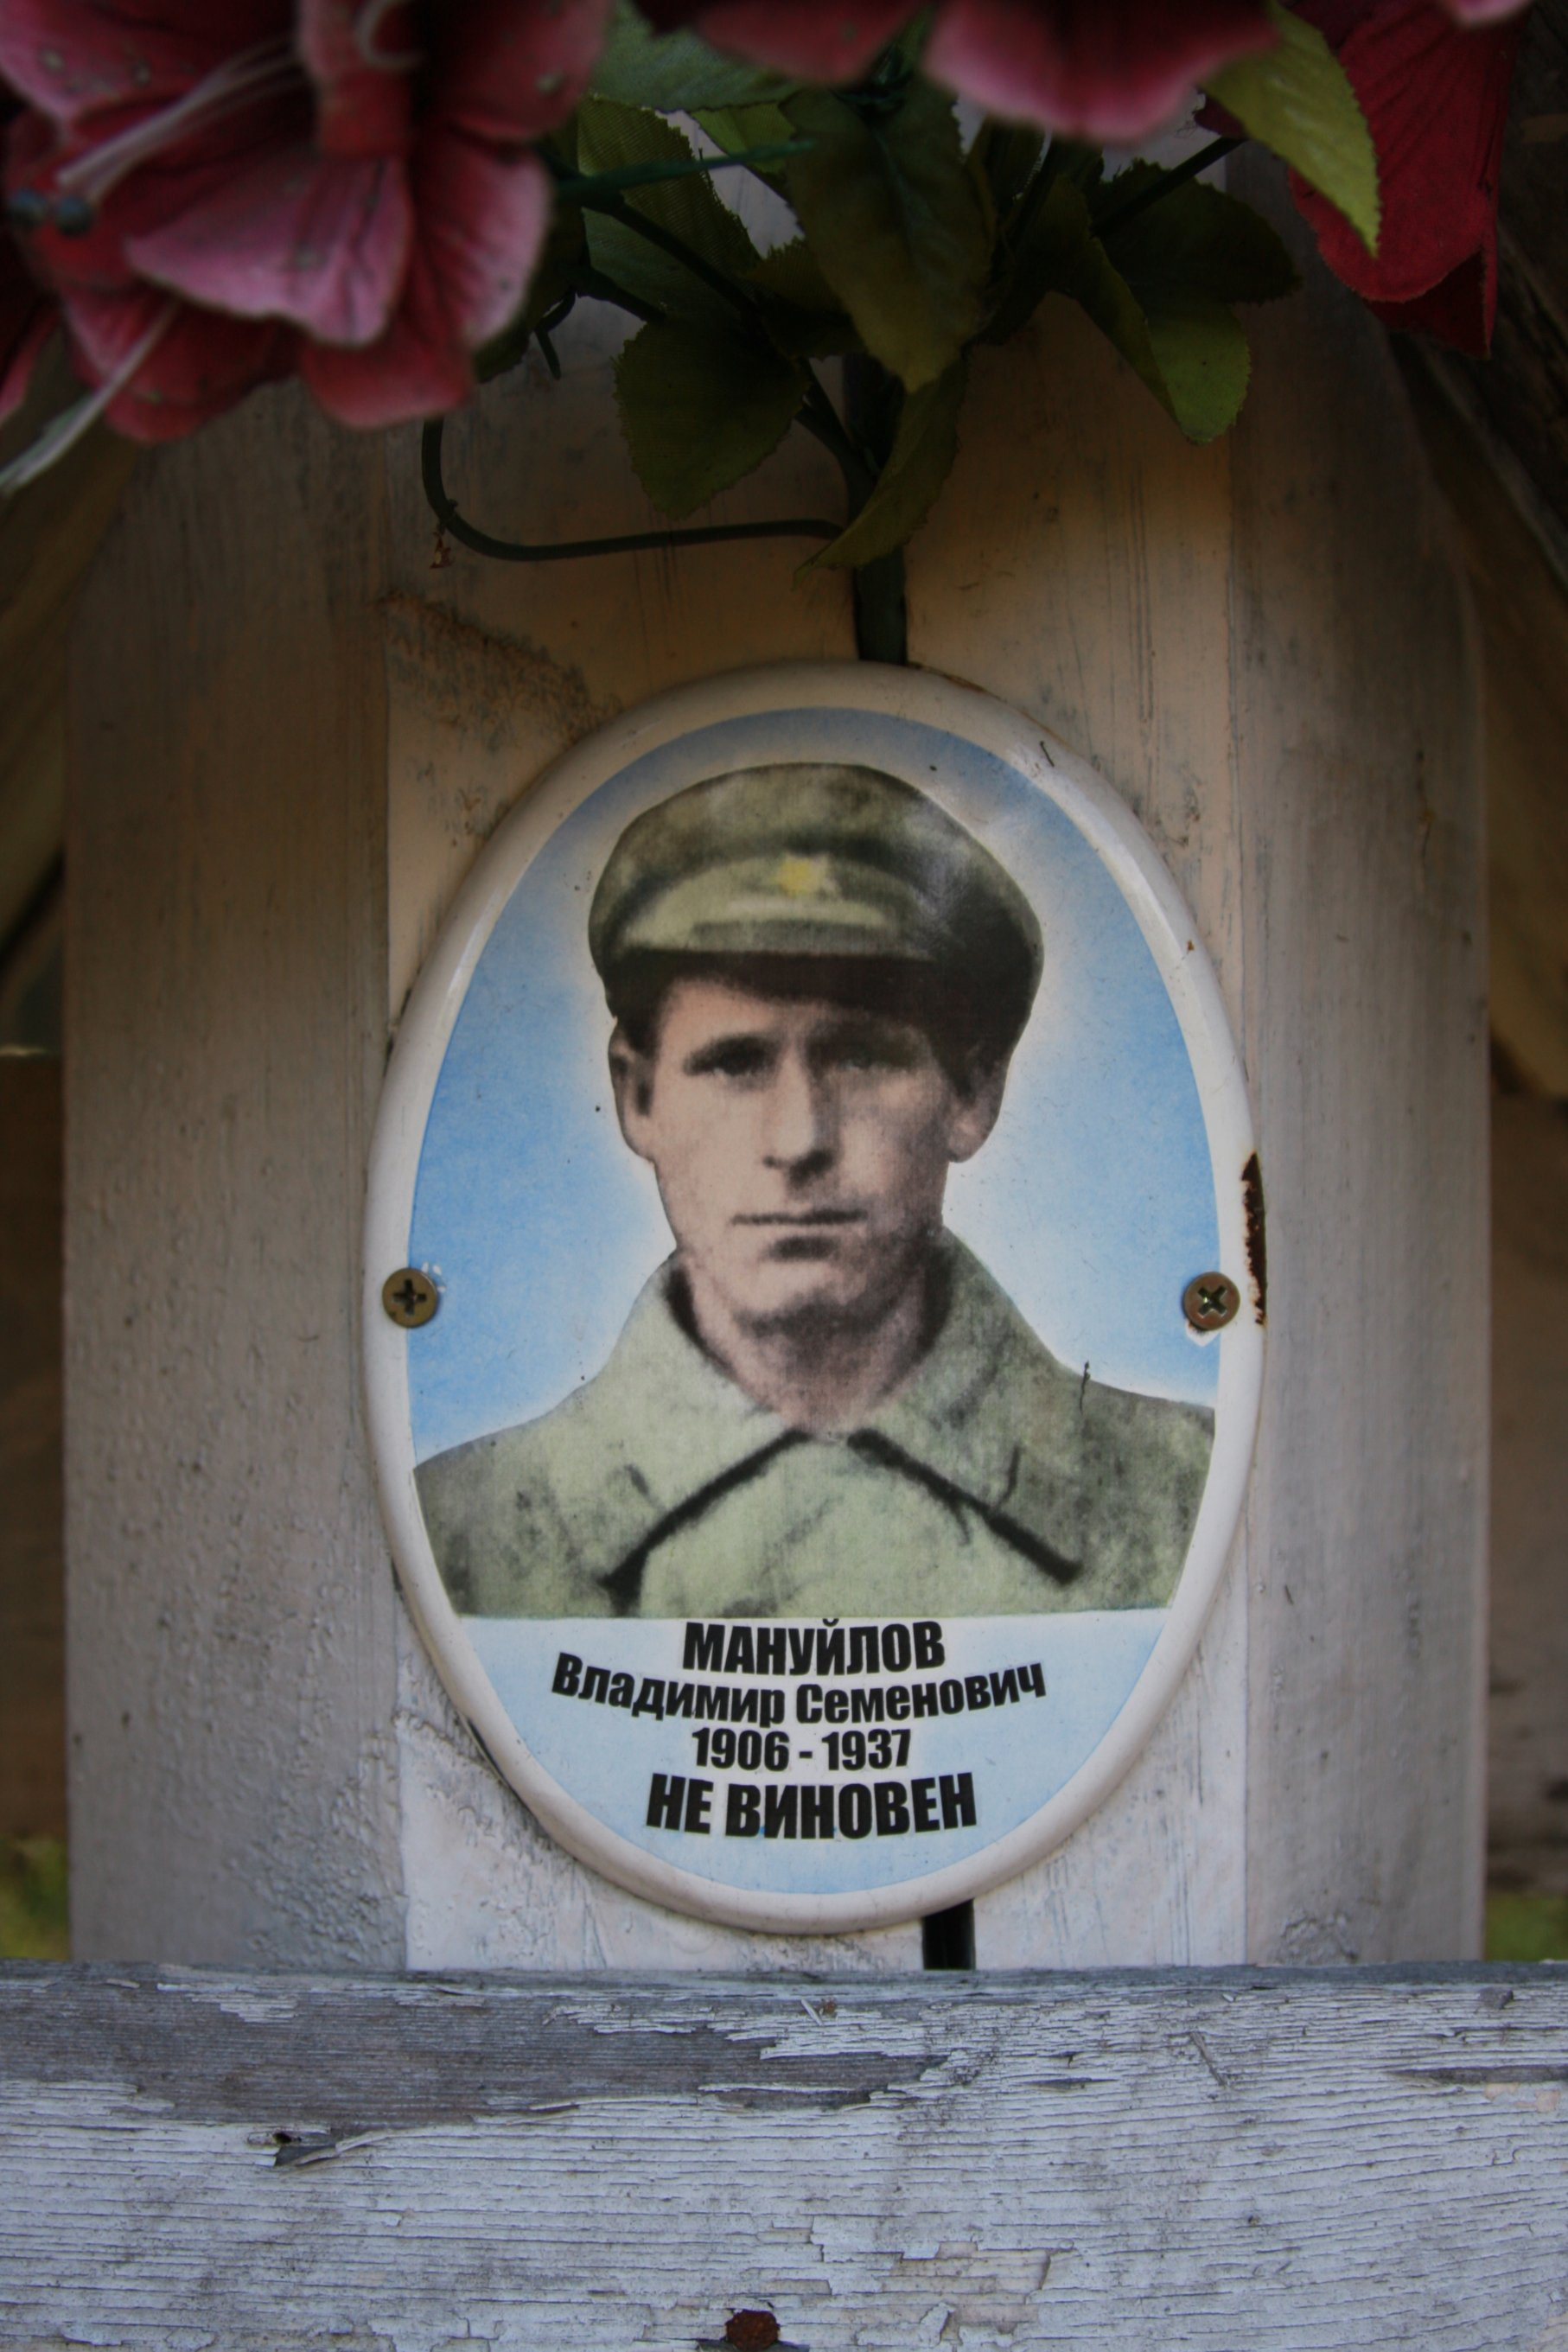 Памятная табличка «Мануйлов Владимир Семенович». Фото 04.08.2018.